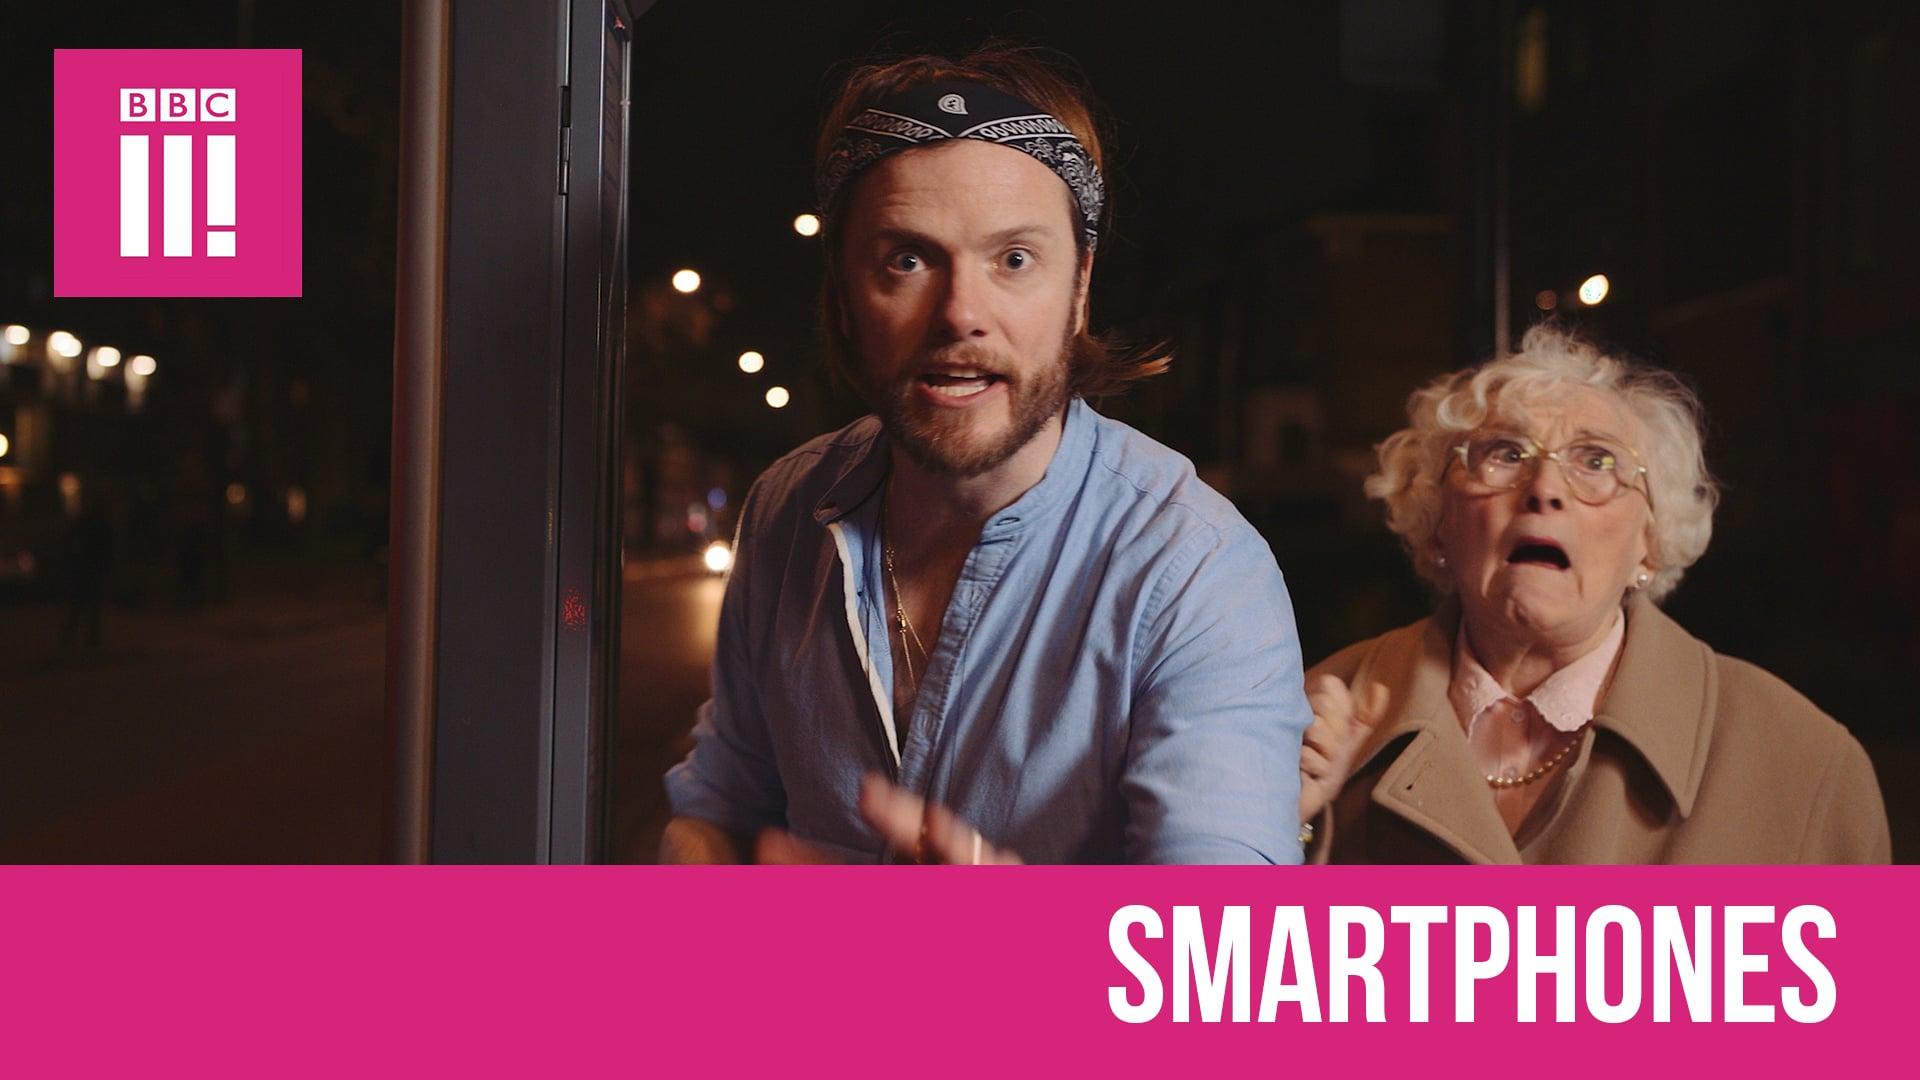 Smartphones - BBC Three